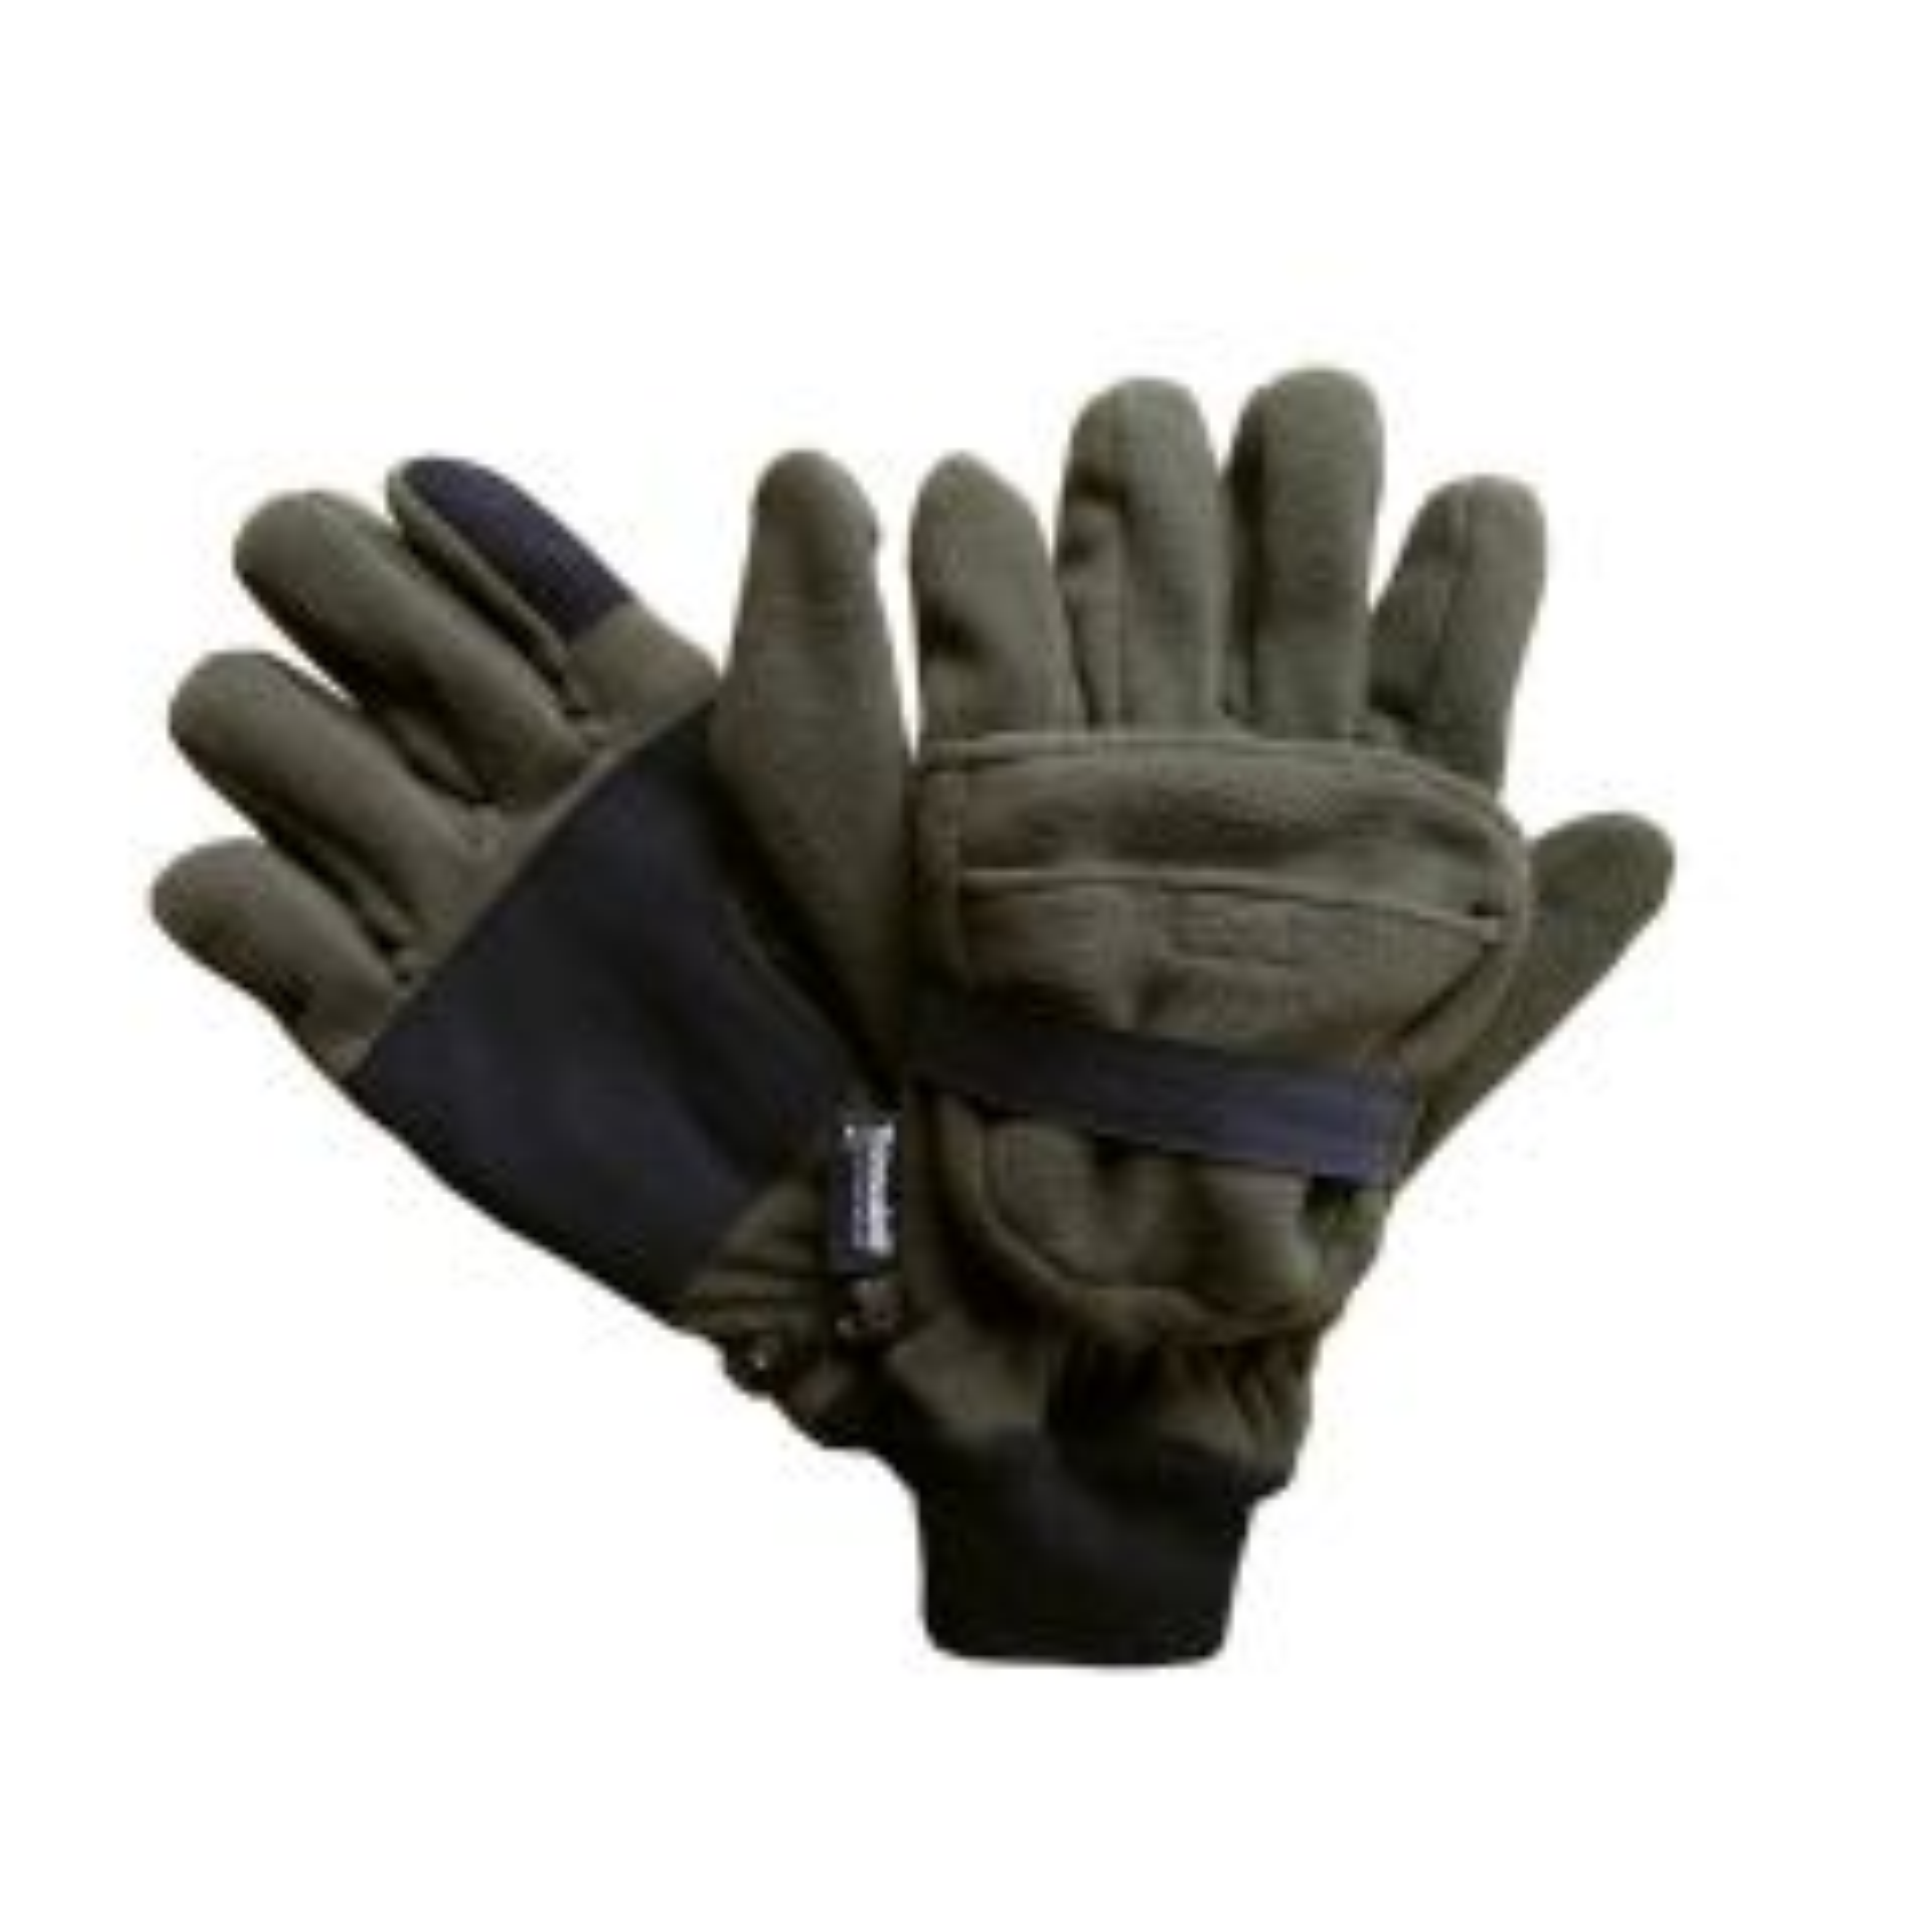 Frankonia Handschuhe Gr. XL (3M Thinsulate)